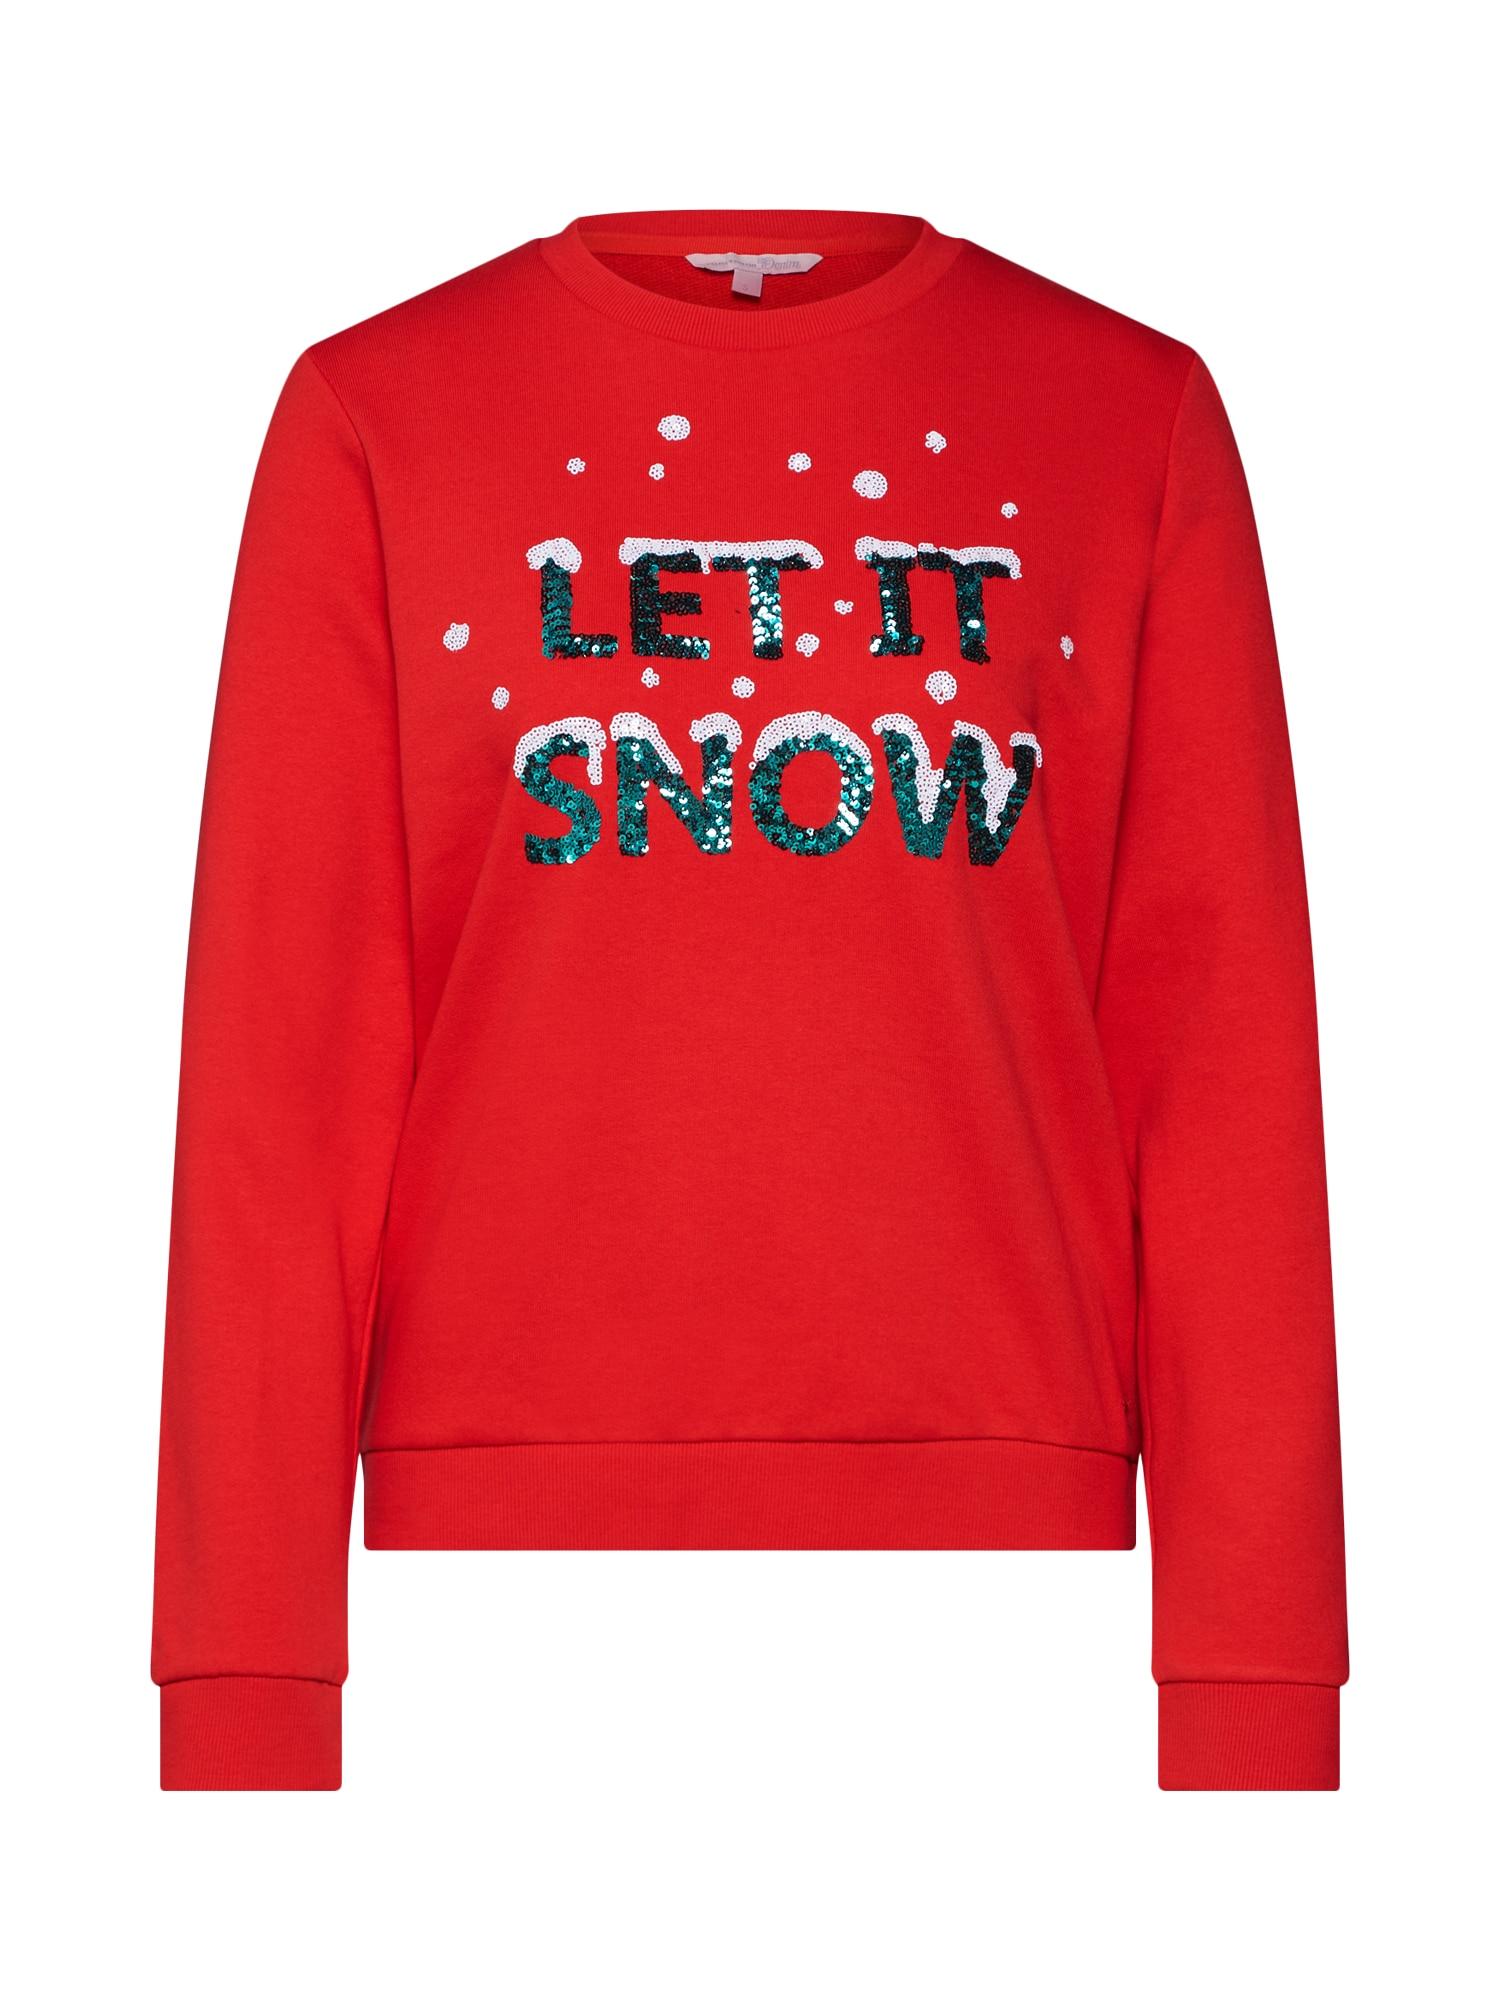 Svetr christmas sweatshirt Sweatshirt 11 oranžově červená TOM TAILOR DENIM